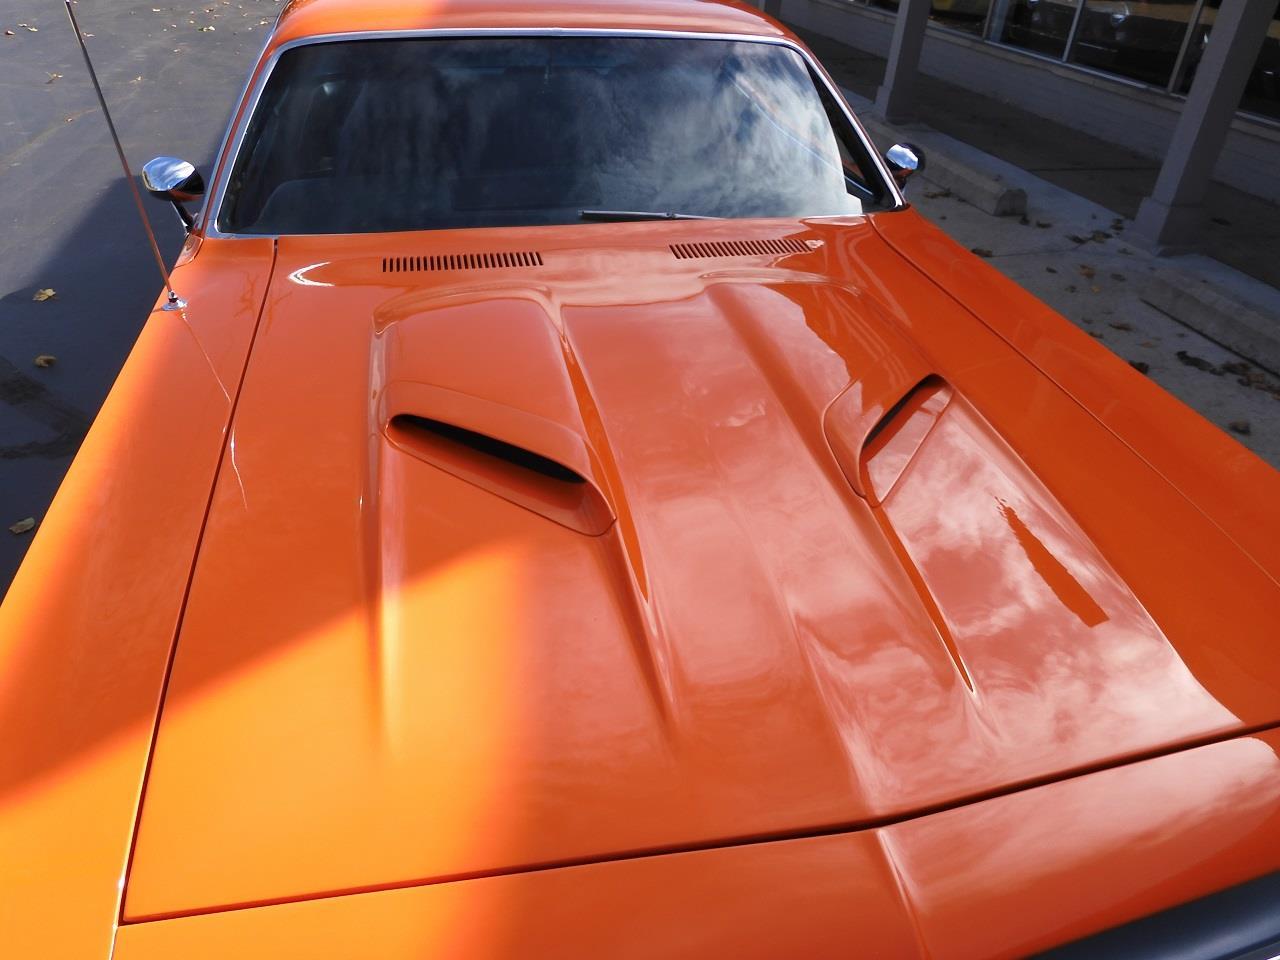 1973 Plymouth Barracuda (CC-1413587) for sale in Clarkston, Michigan